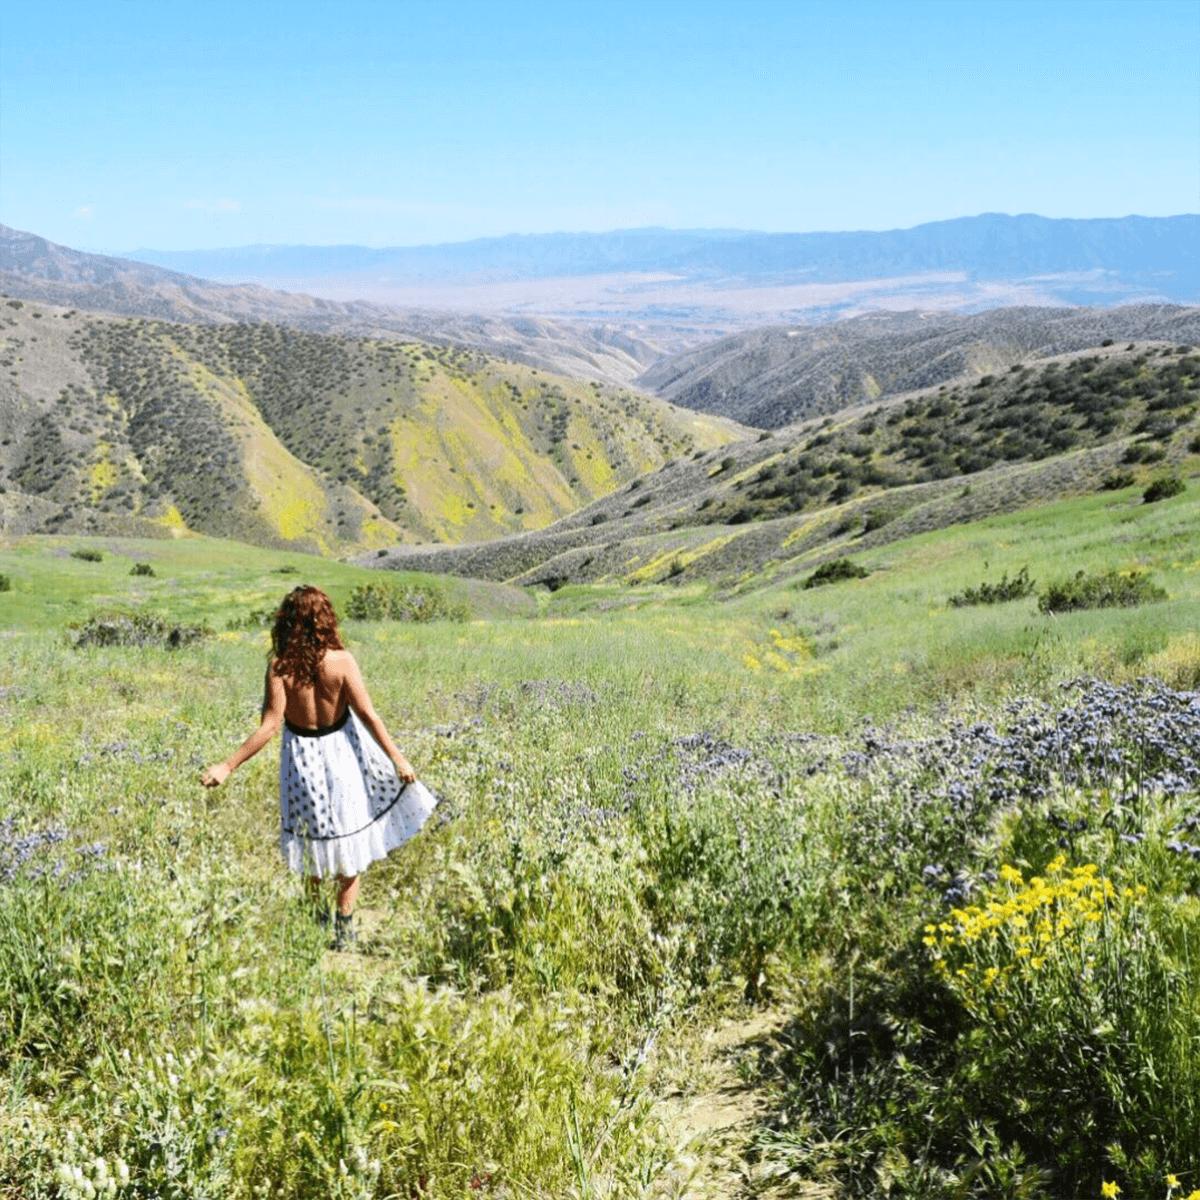 woman at carrizo plain california hills of wildflowers